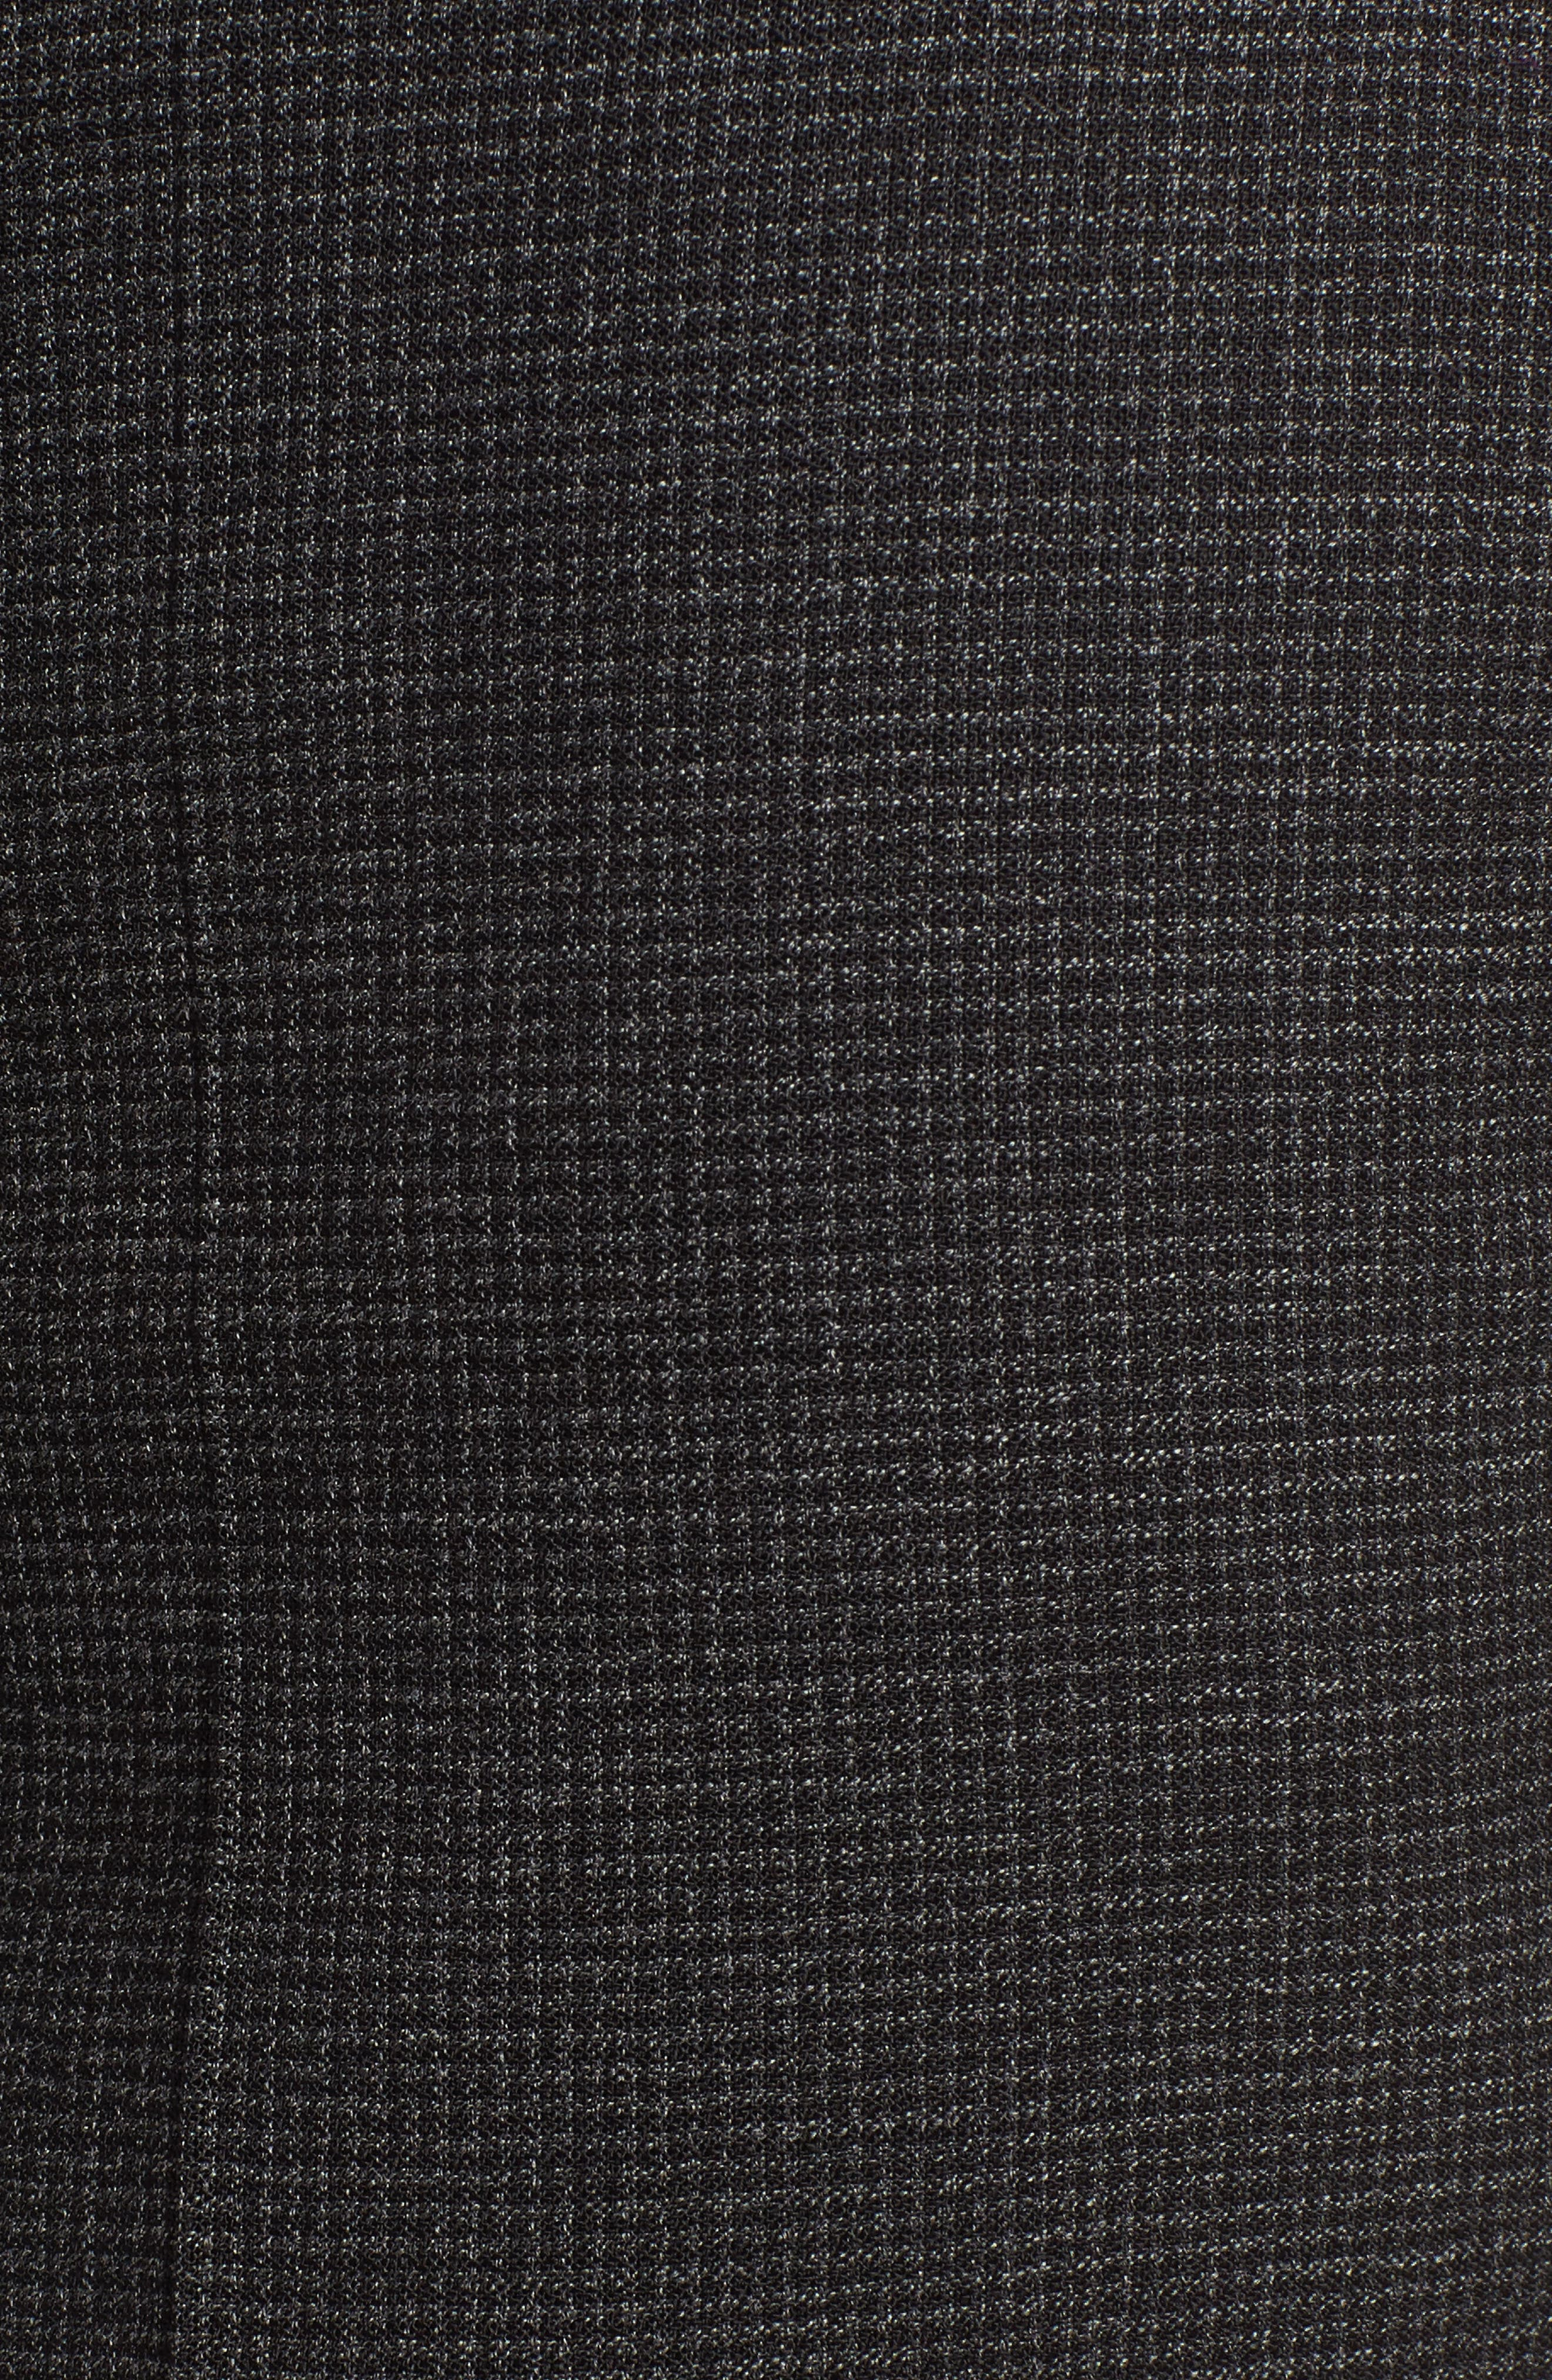 Tafena Check Stretch Wool Pants,                             Alternate thumbnail 5, color,                             006